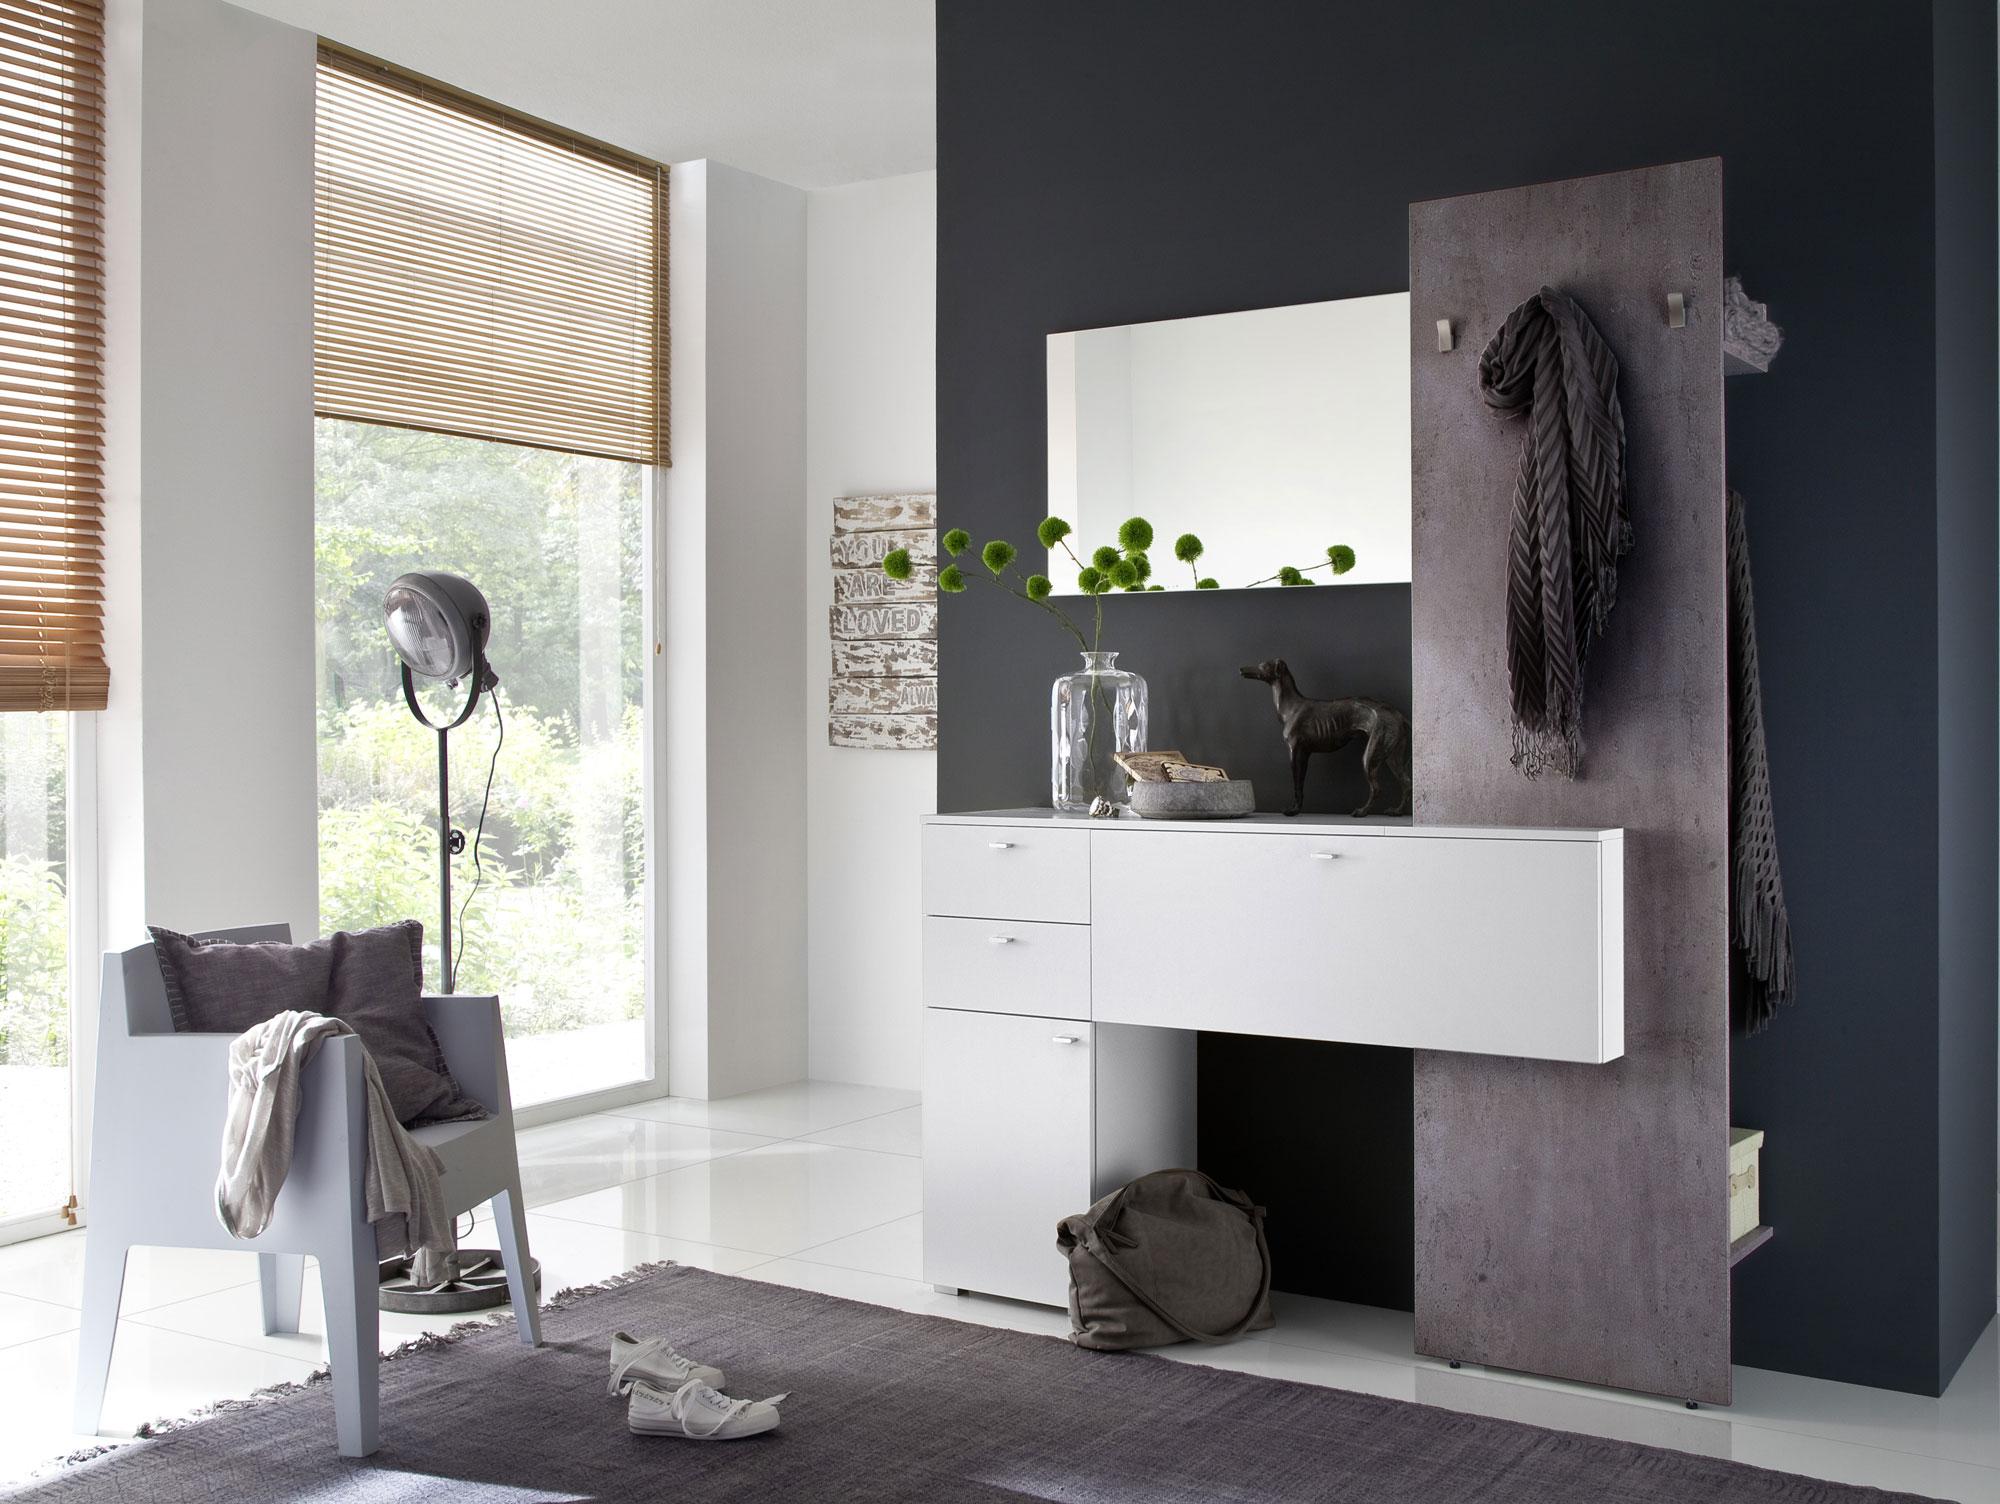 Zarah iii garderobenkombi wei beton for Garderobe komplett programme